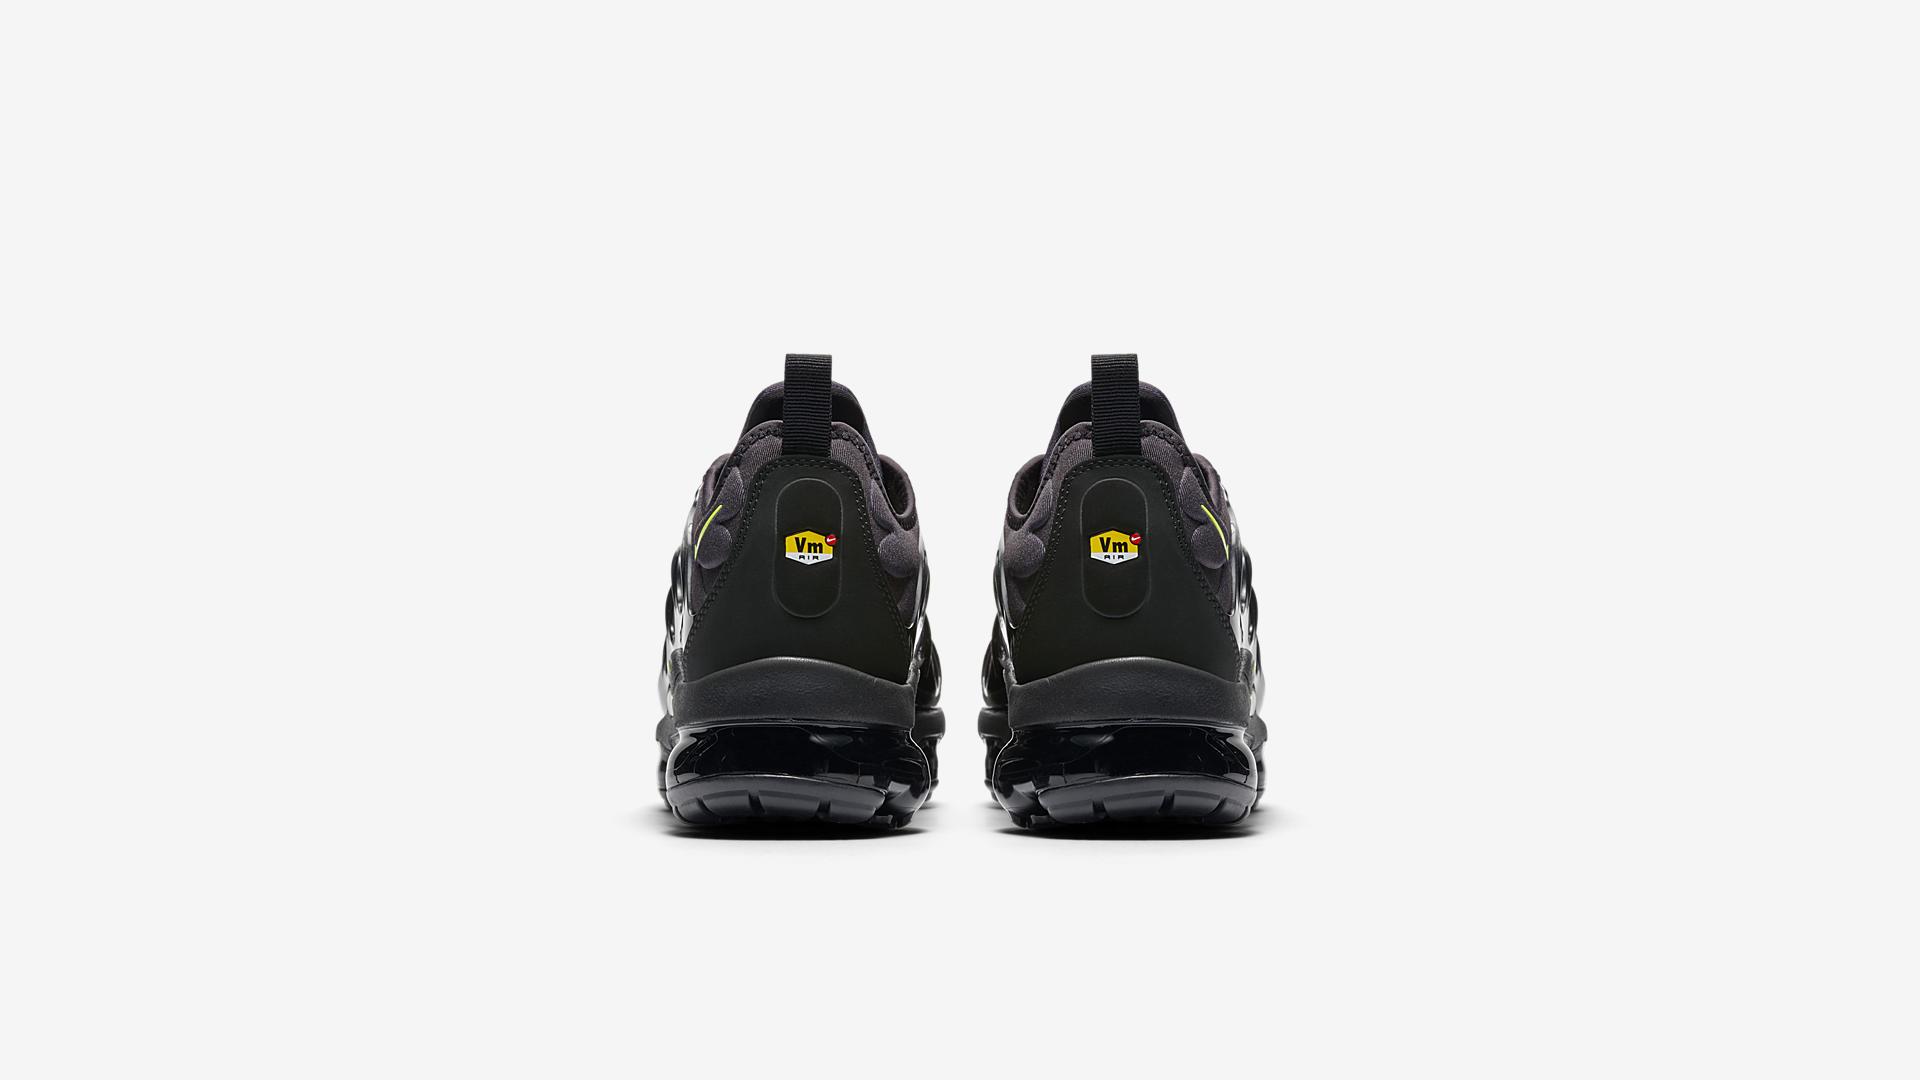 924453 009 Nike Air Vapormax Plus Black Volt 2